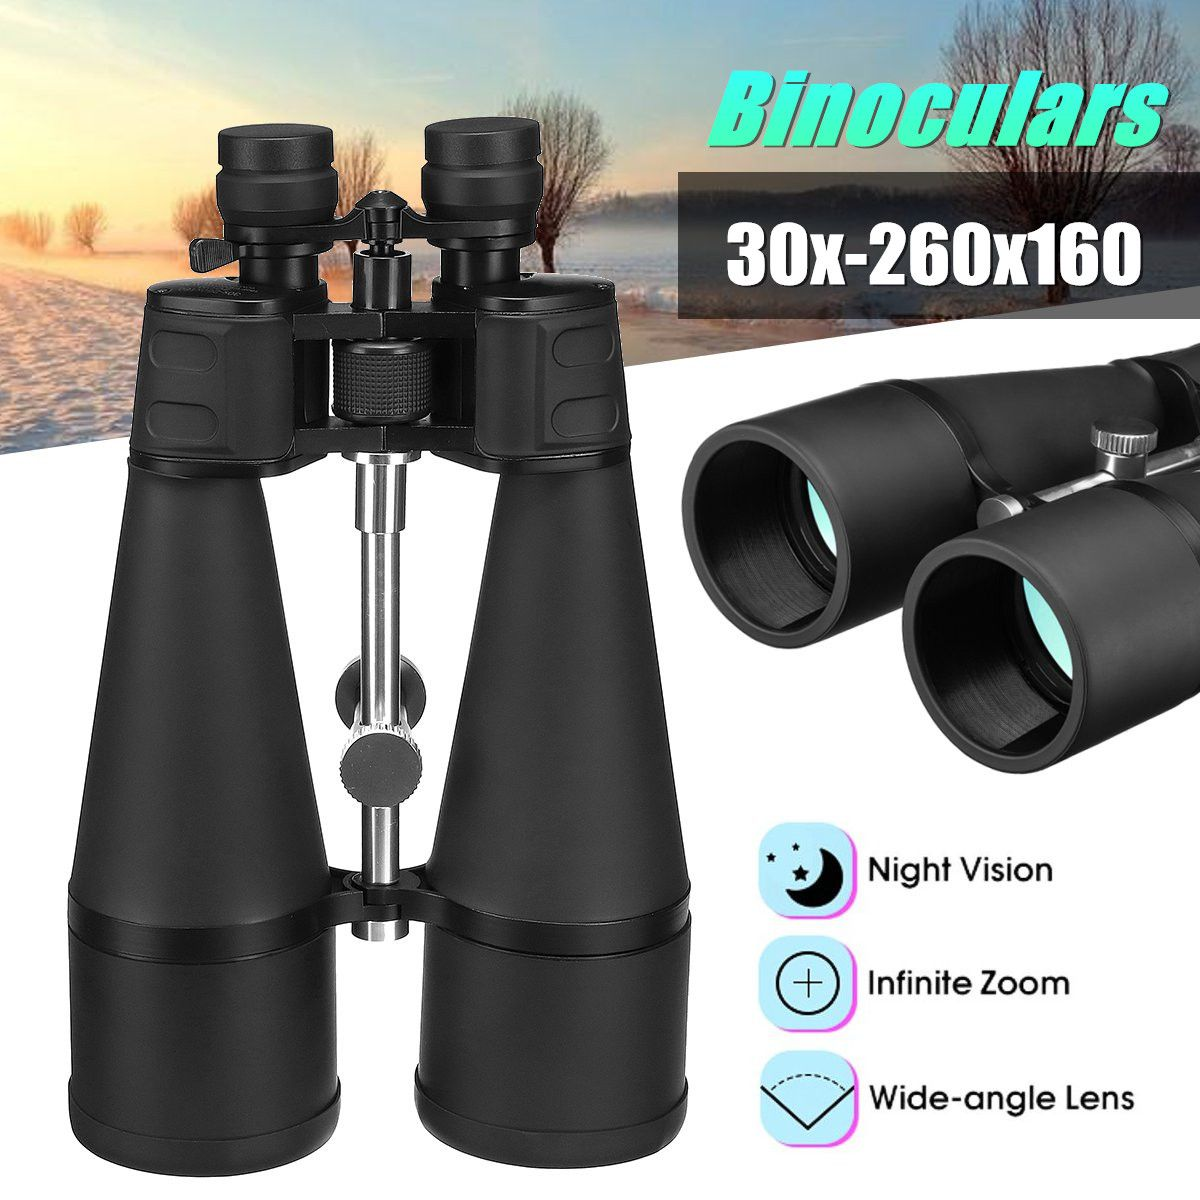 Optical Green Lens Binoculars 30x-260x160 High Magnification Long Range Zoom Objective Diameter 160mm+lens Cloth